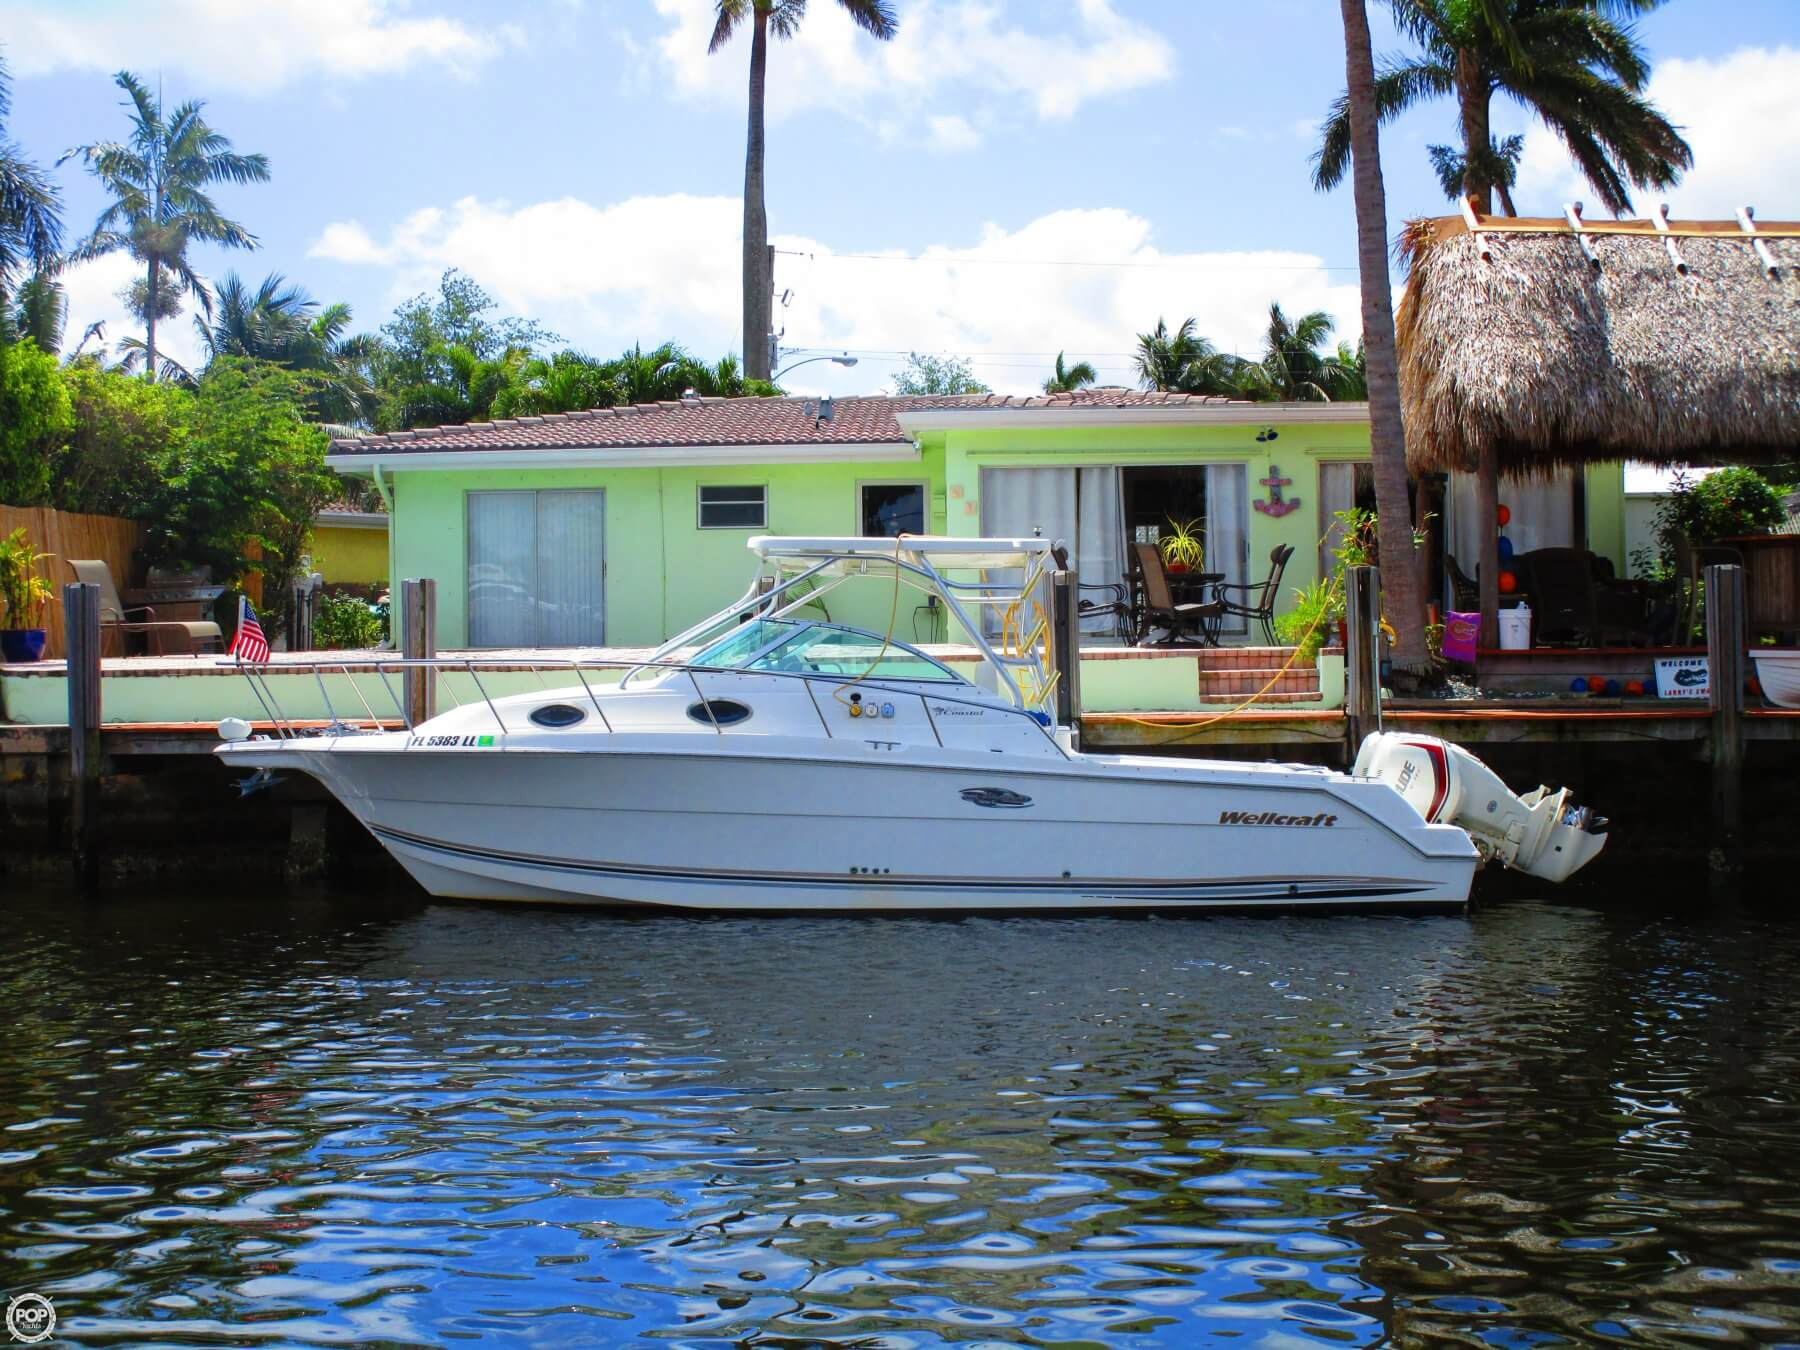 Wellcraft 290 Coastal boat for sale in Pompano Beach FL for $52 900